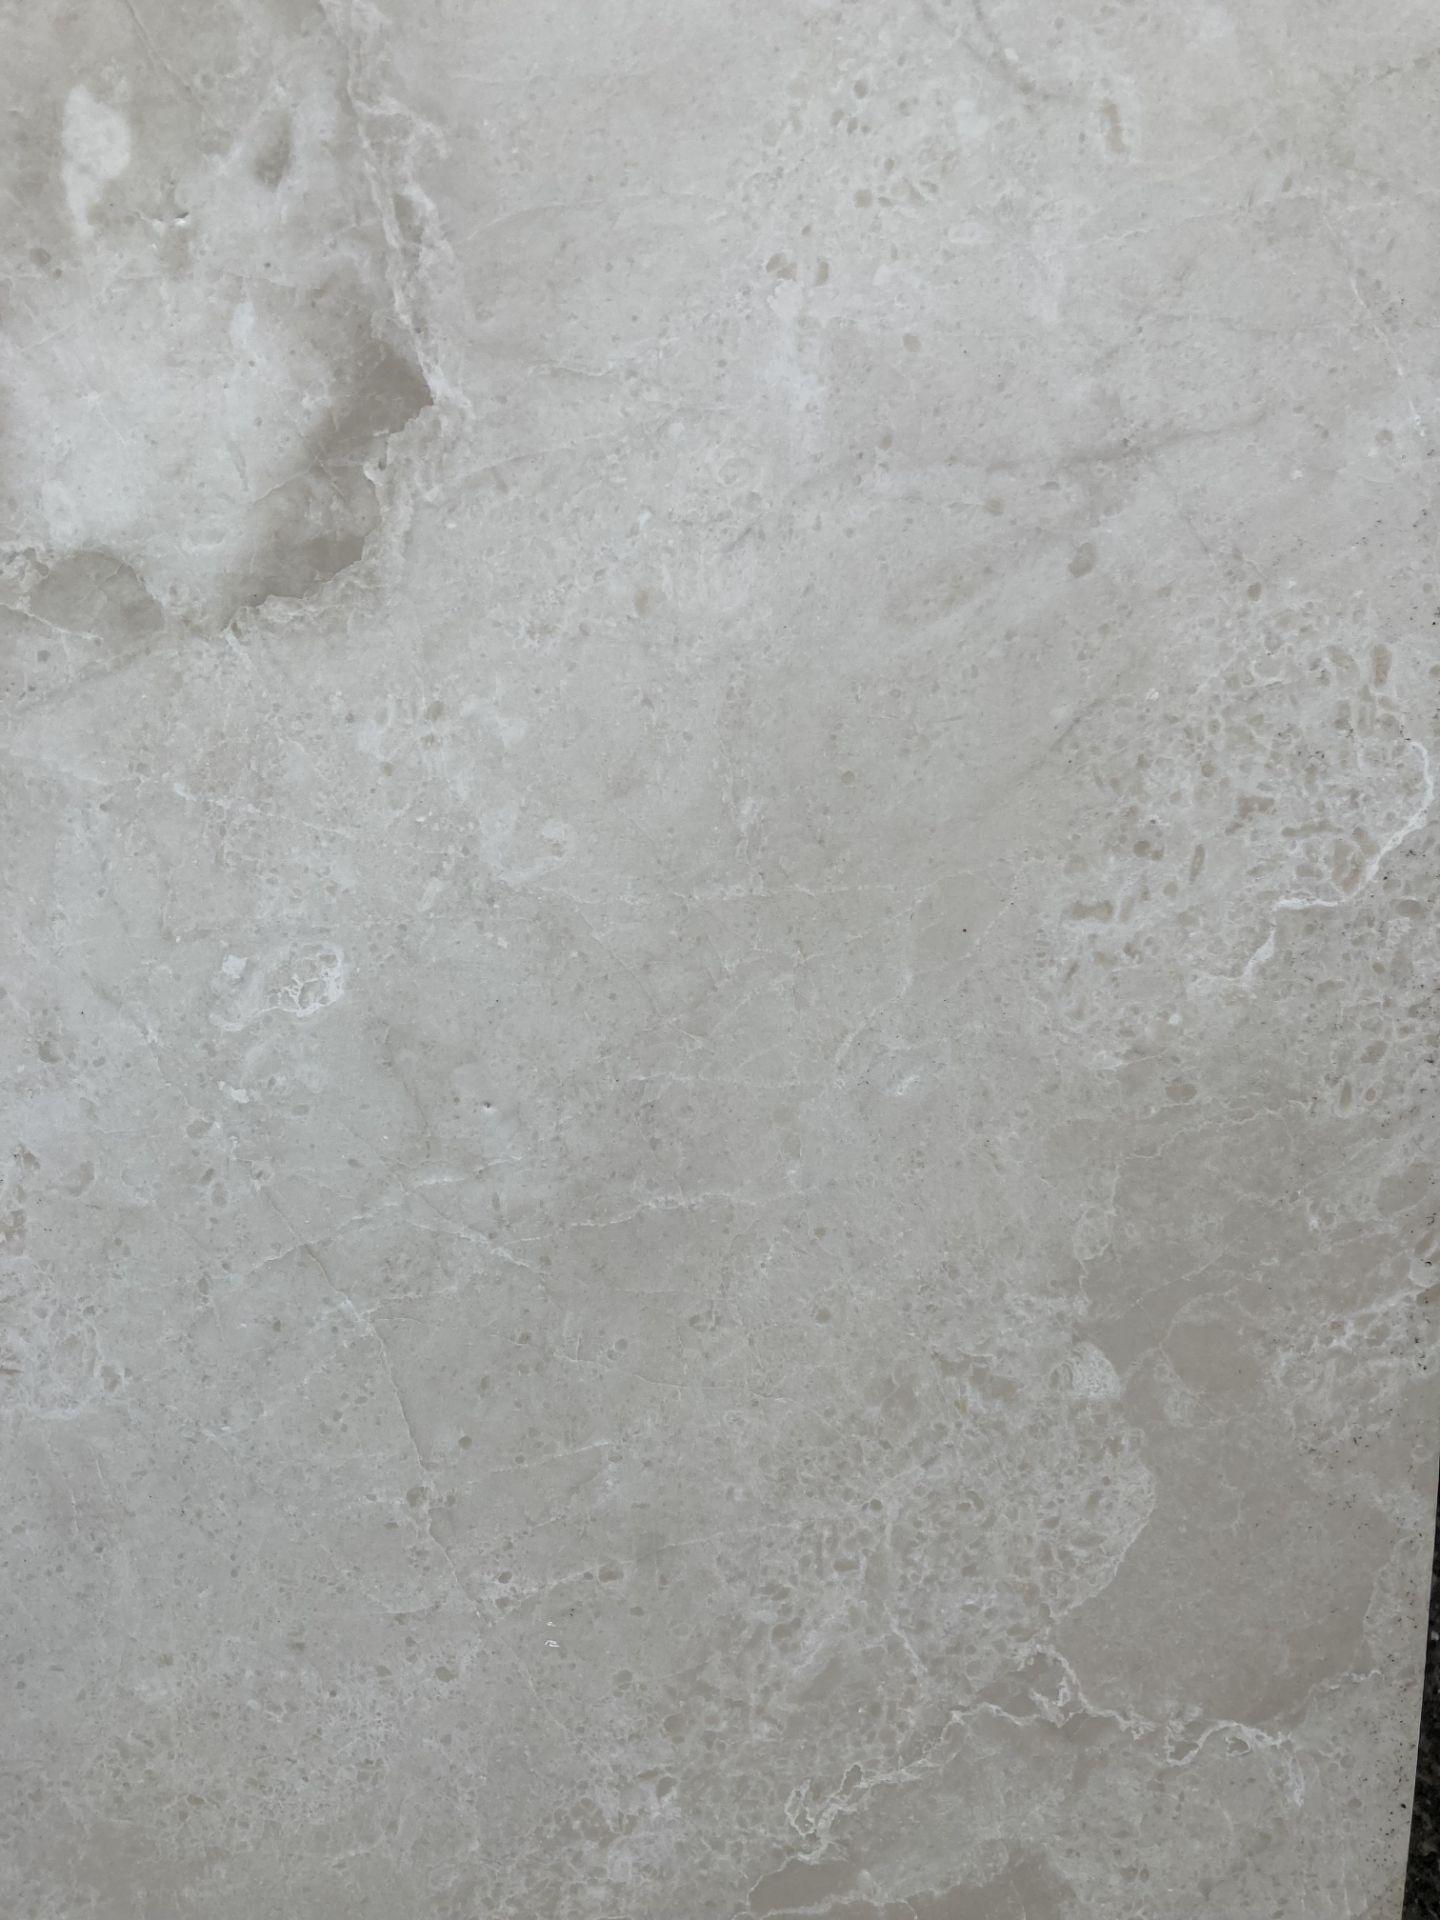 20 x packs of 4 marble tiles in Rosoni beige - 30 x 60 x 1. - Image 2 of 3